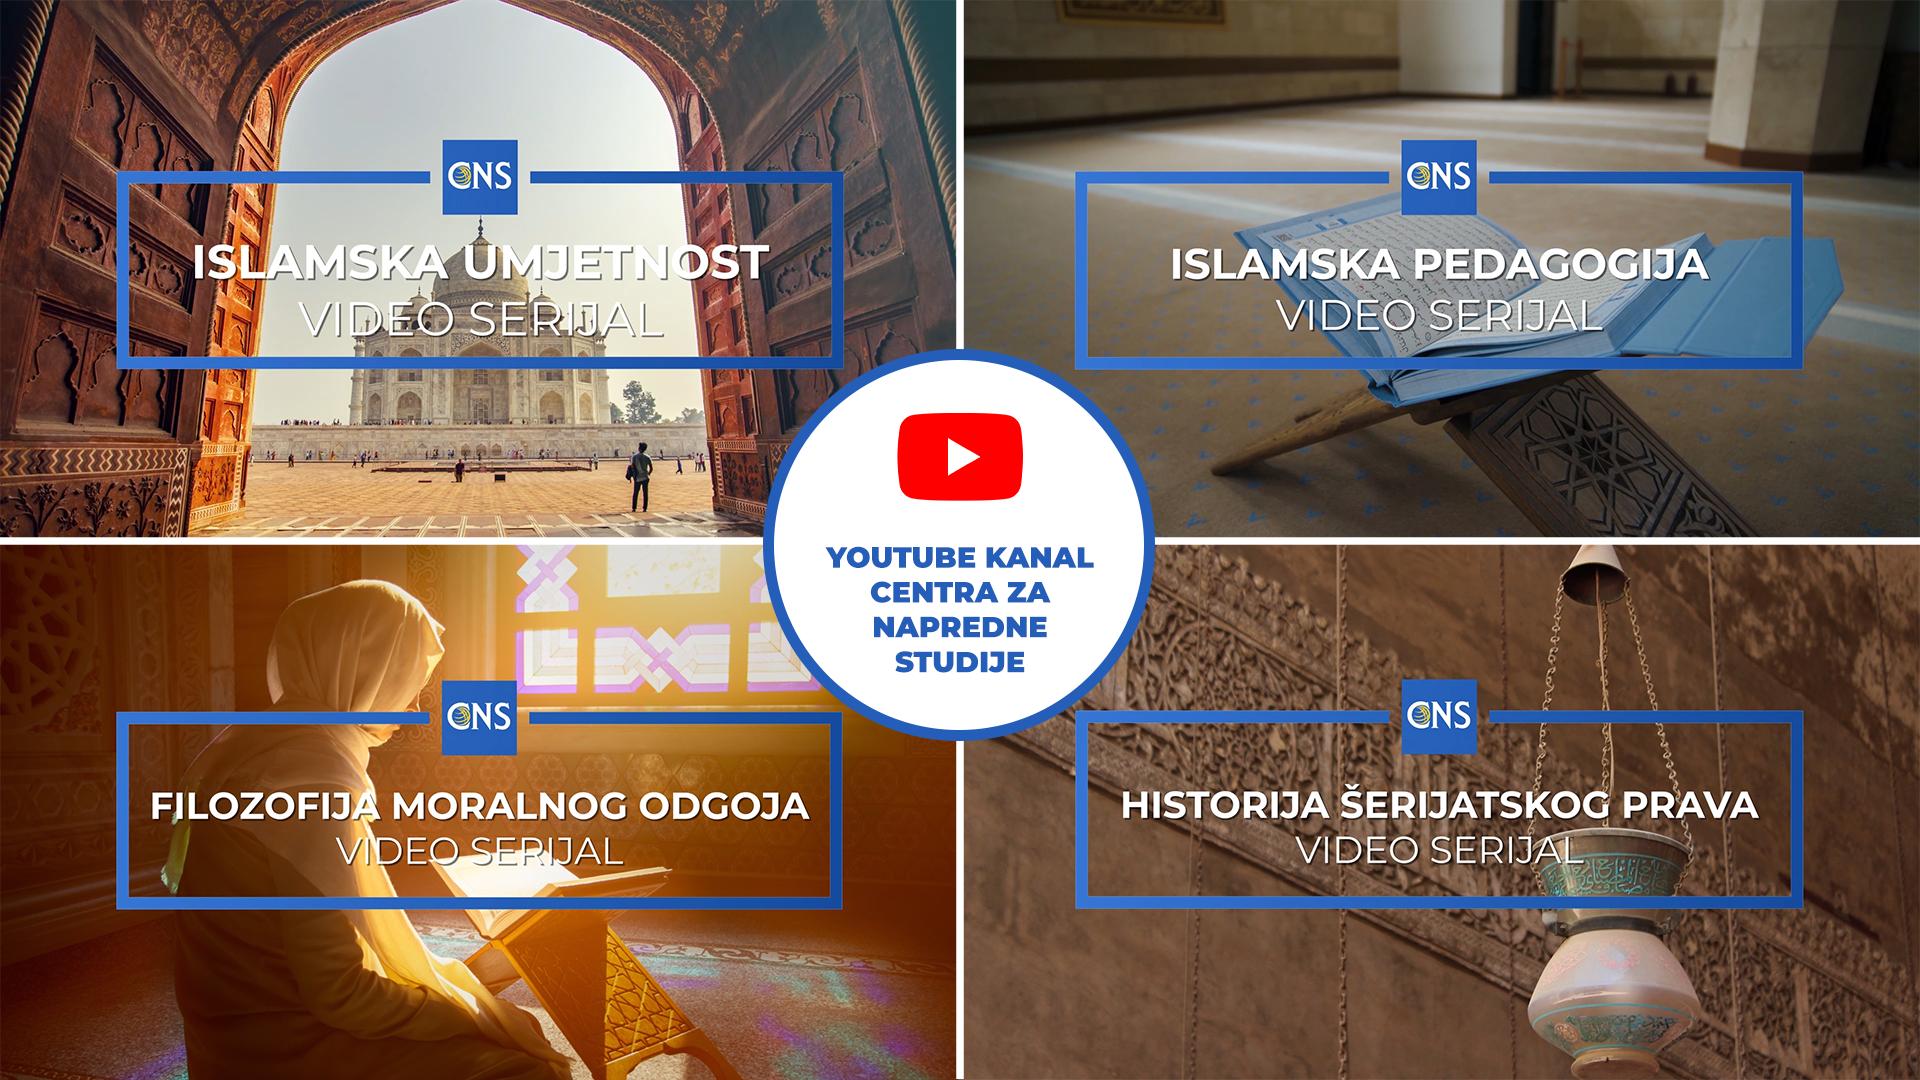 Edukativni video moduli Centra za napredne studije